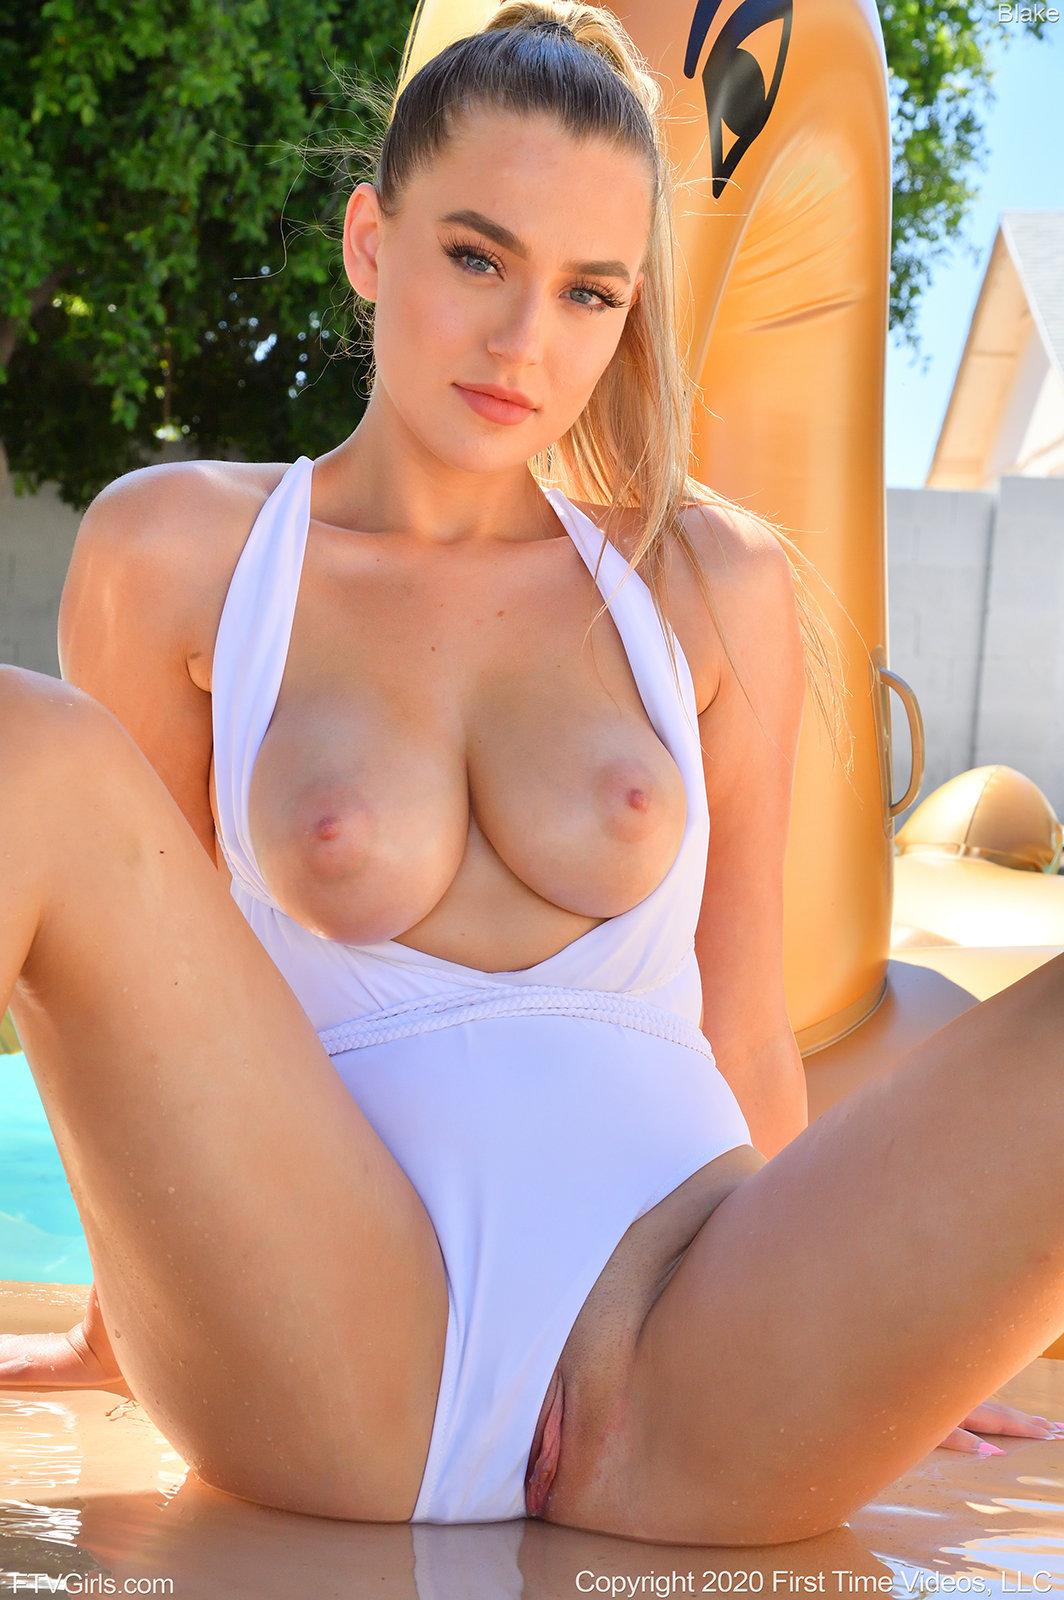 showing images for naturals anal xxx #Mia #blonde #blueeyes #triangle #pussy #ziplock #shoes #nopanties #pale #arrogantlook #JustPerfect #likeanangel #wow #labia